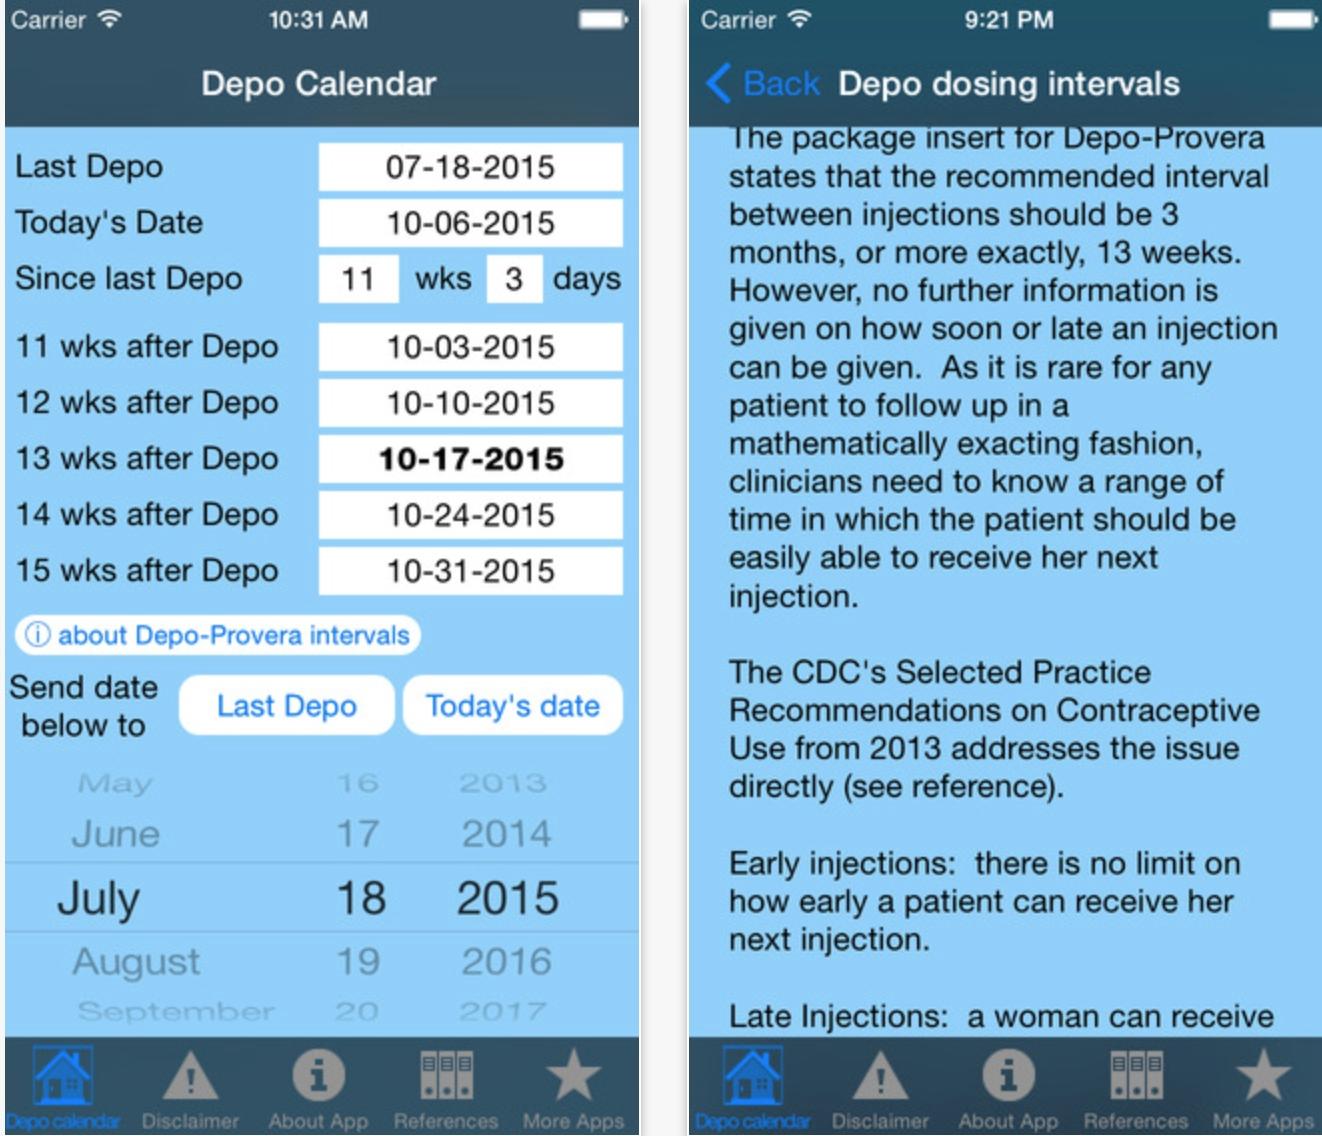 Catch Calendar For Depo Provera